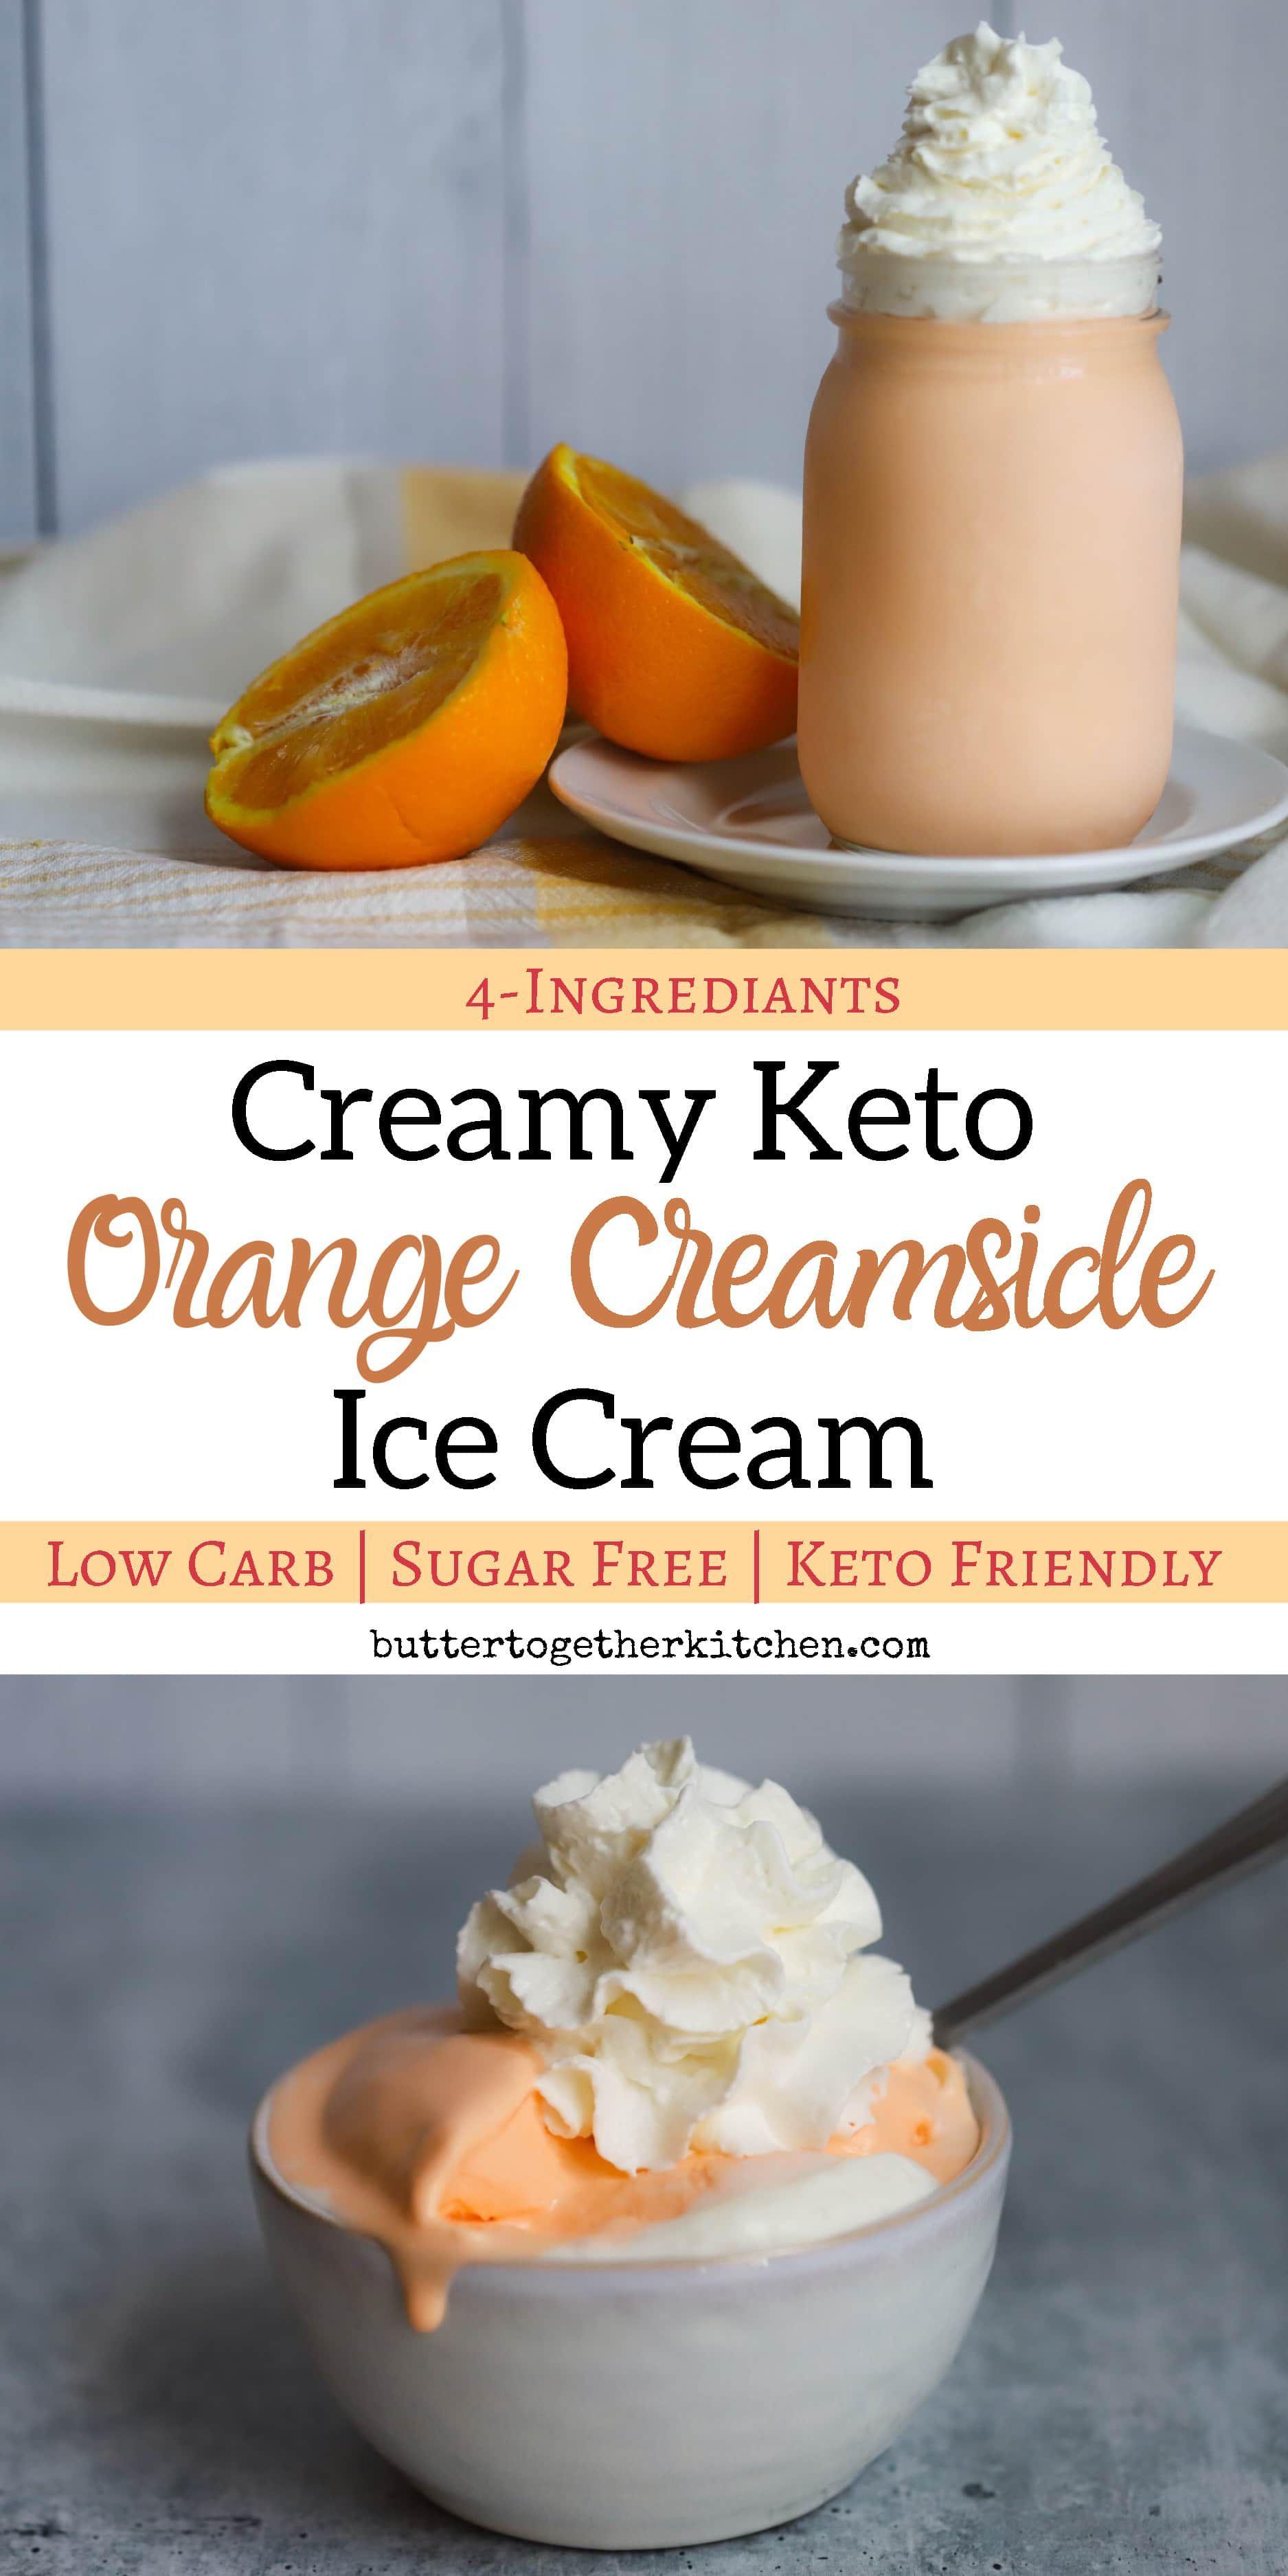 Creamy Keto Orange Creamsicle Ice Cream - This easy keto orange creamsicle ice cream is the perfect summer treat! #ketoicecream #ketoorangecreamsicle #ketodessert | buttertogetherkitchen.com #ketoicecream